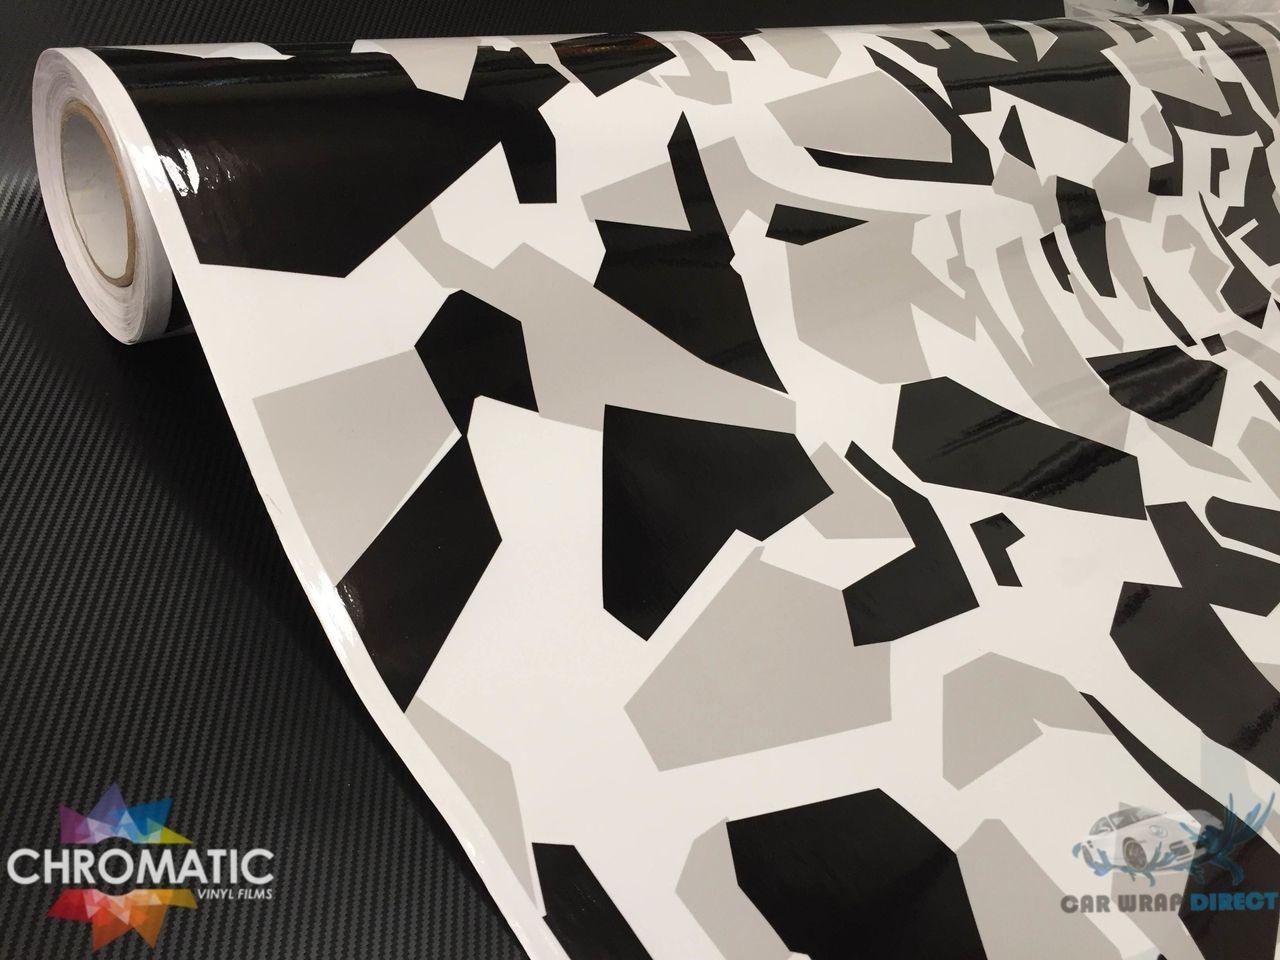 Car Wrap Direct Digital Arctic Snow Camo Vinyl With Adt Span Class Productdetailspriceinctax 24 99 Inc Vat Spa Vinyl Wrap Carbon Fiber Vinyl Car Wrap